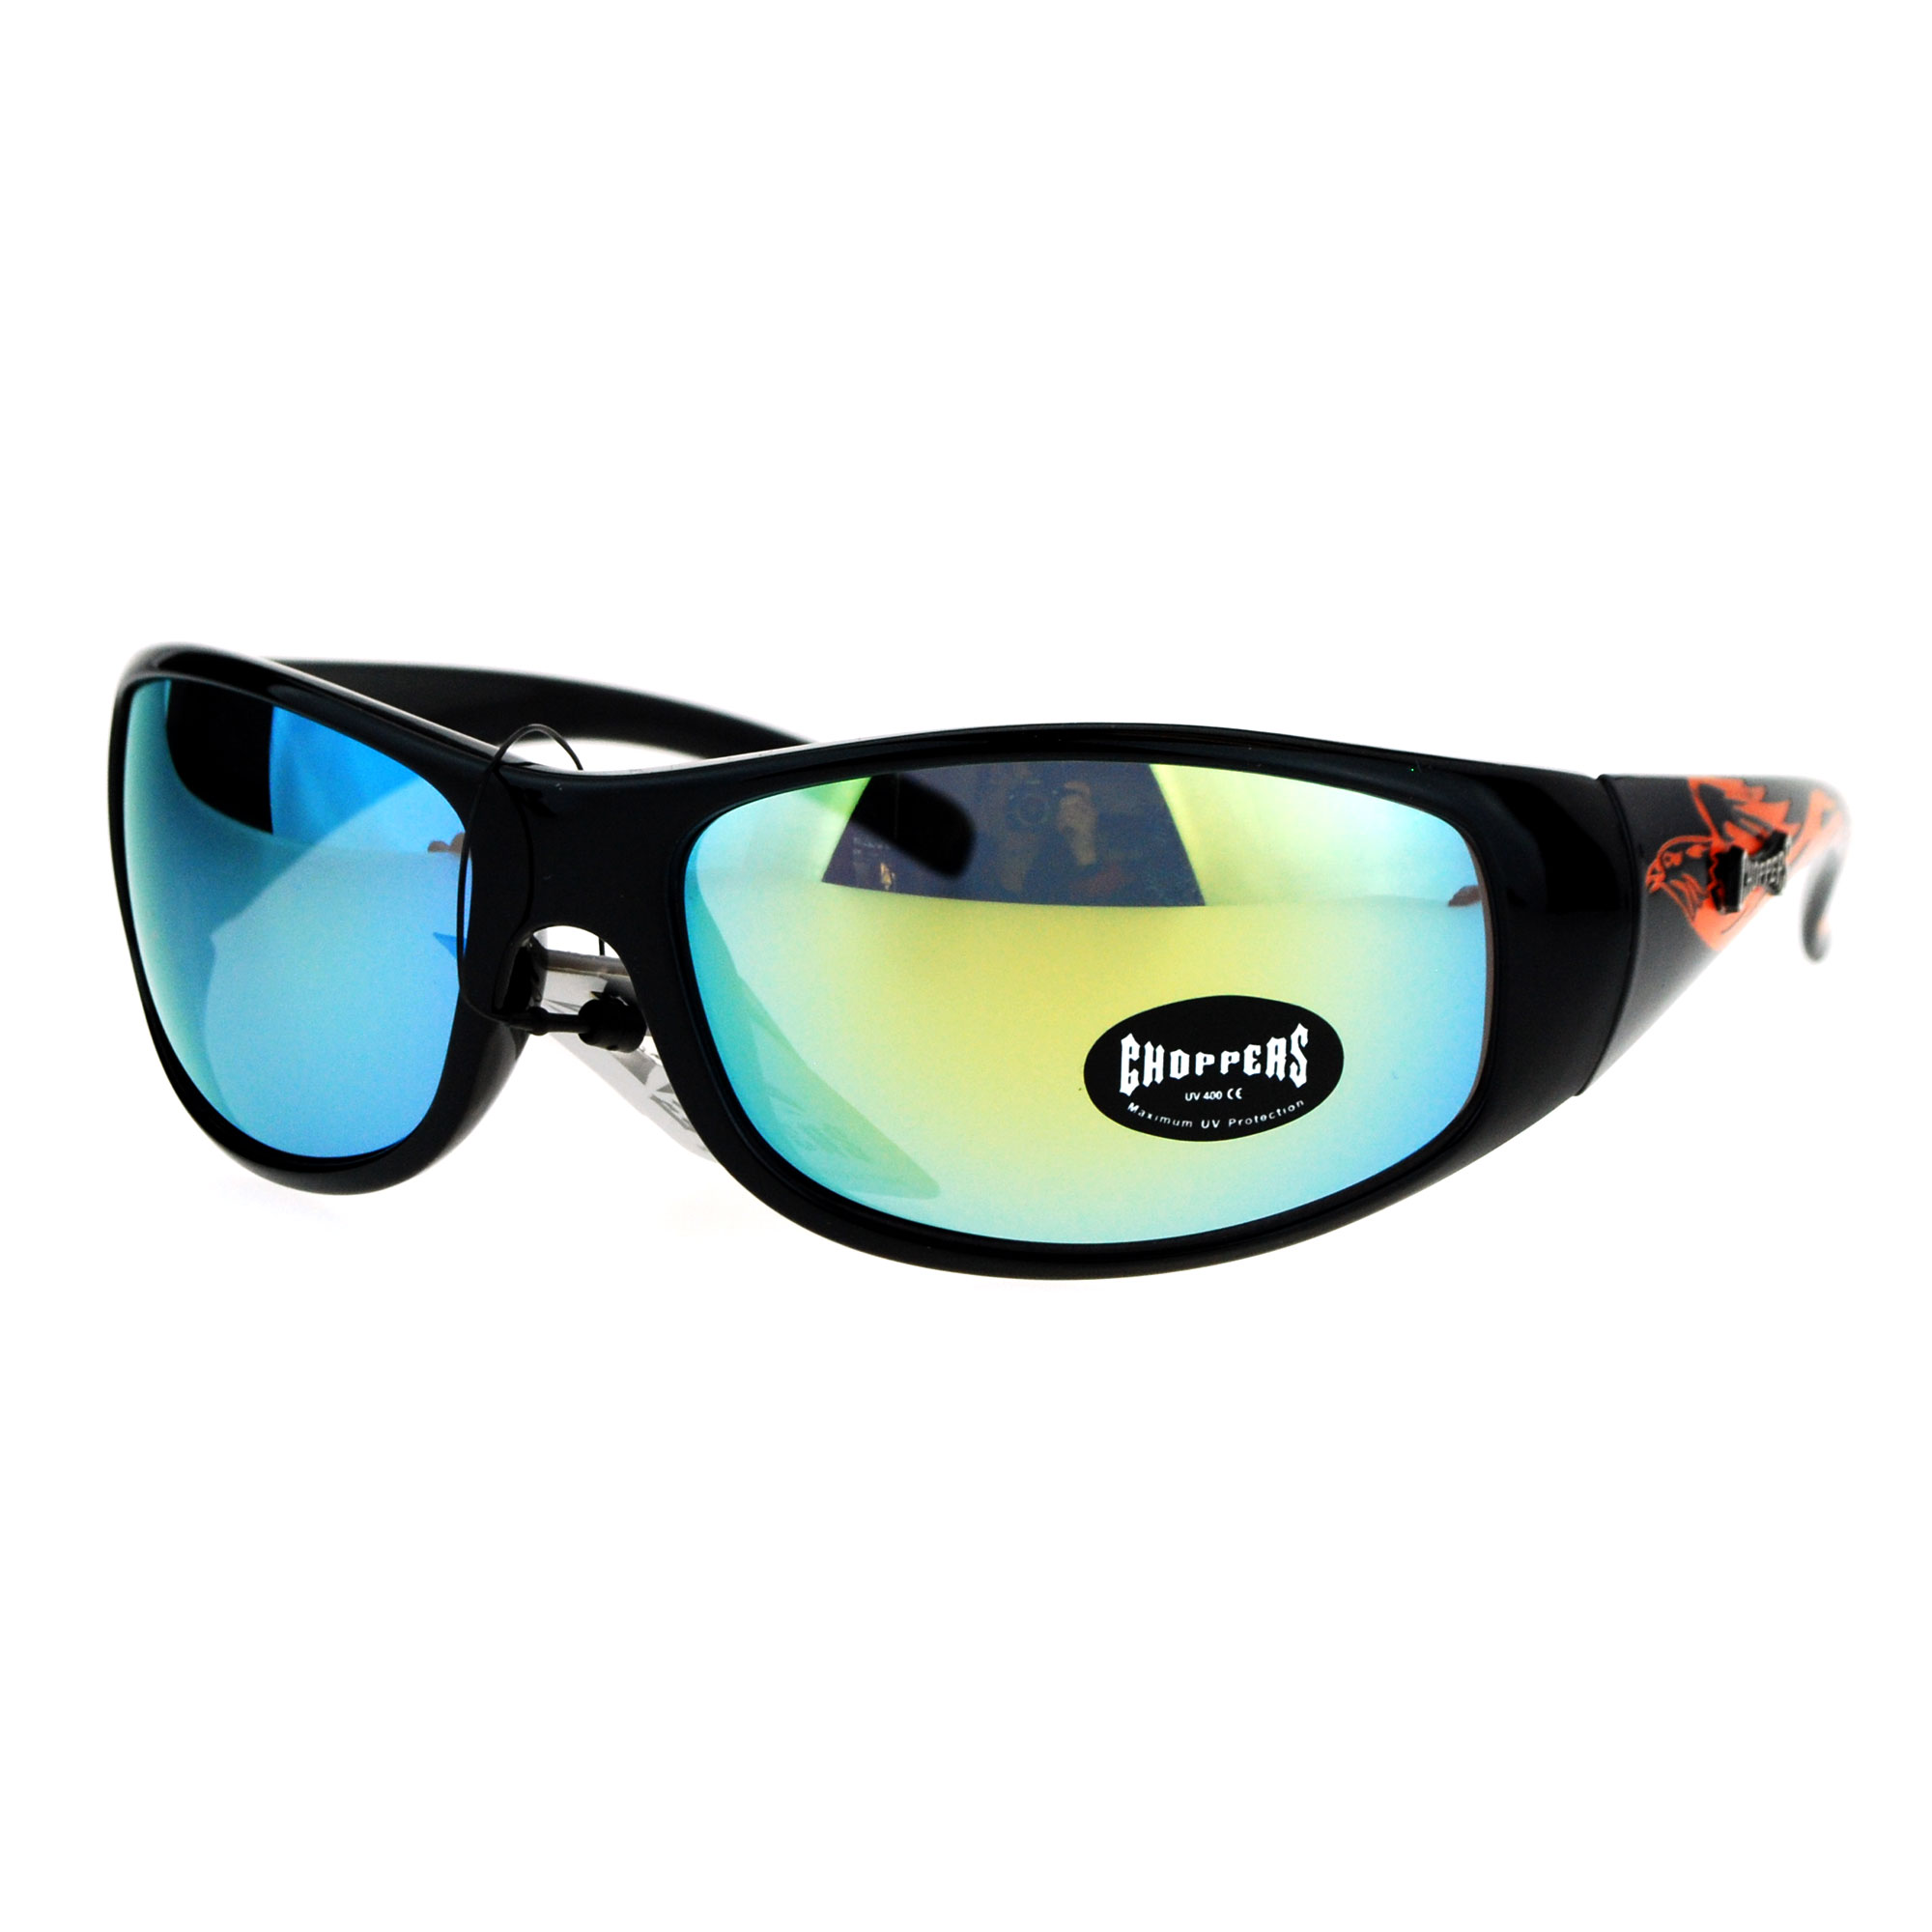 Choppers Flaming Eagle Warp Around Biker Motorcycle Sunglasses Black Blue